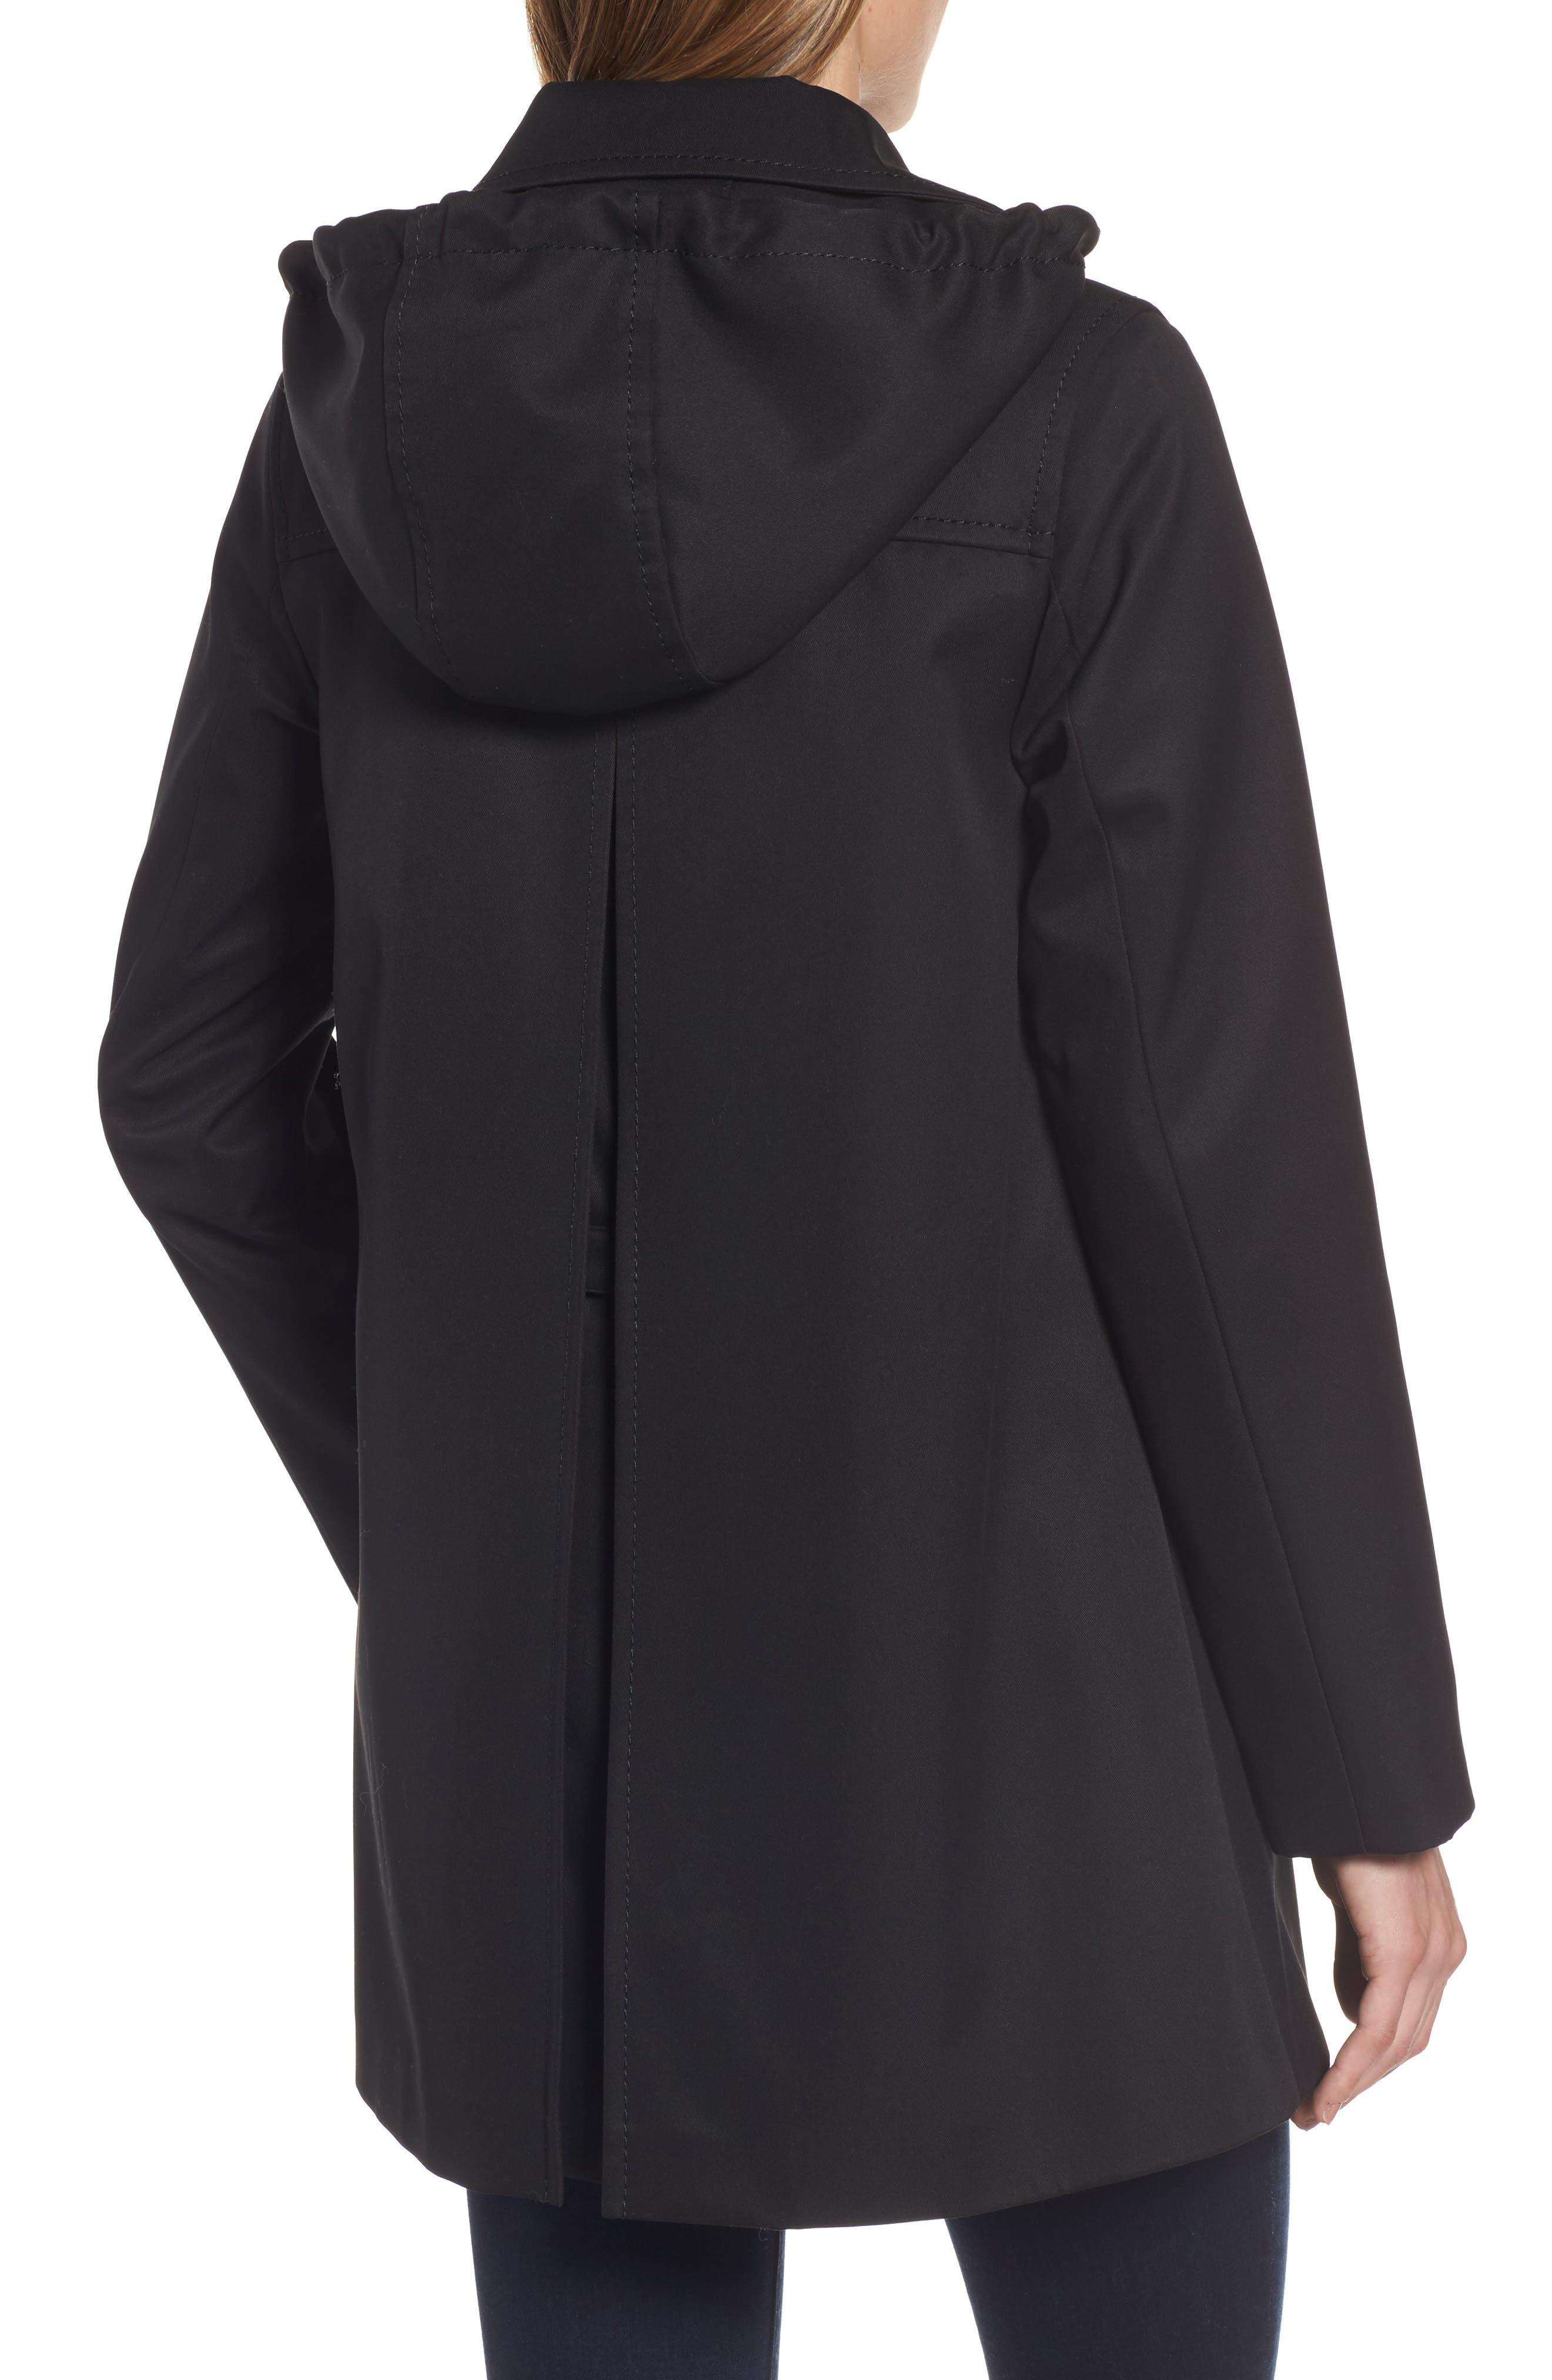 scallop pocket a-line raincoat,                             Alternate thumbnail 2, color,                             001